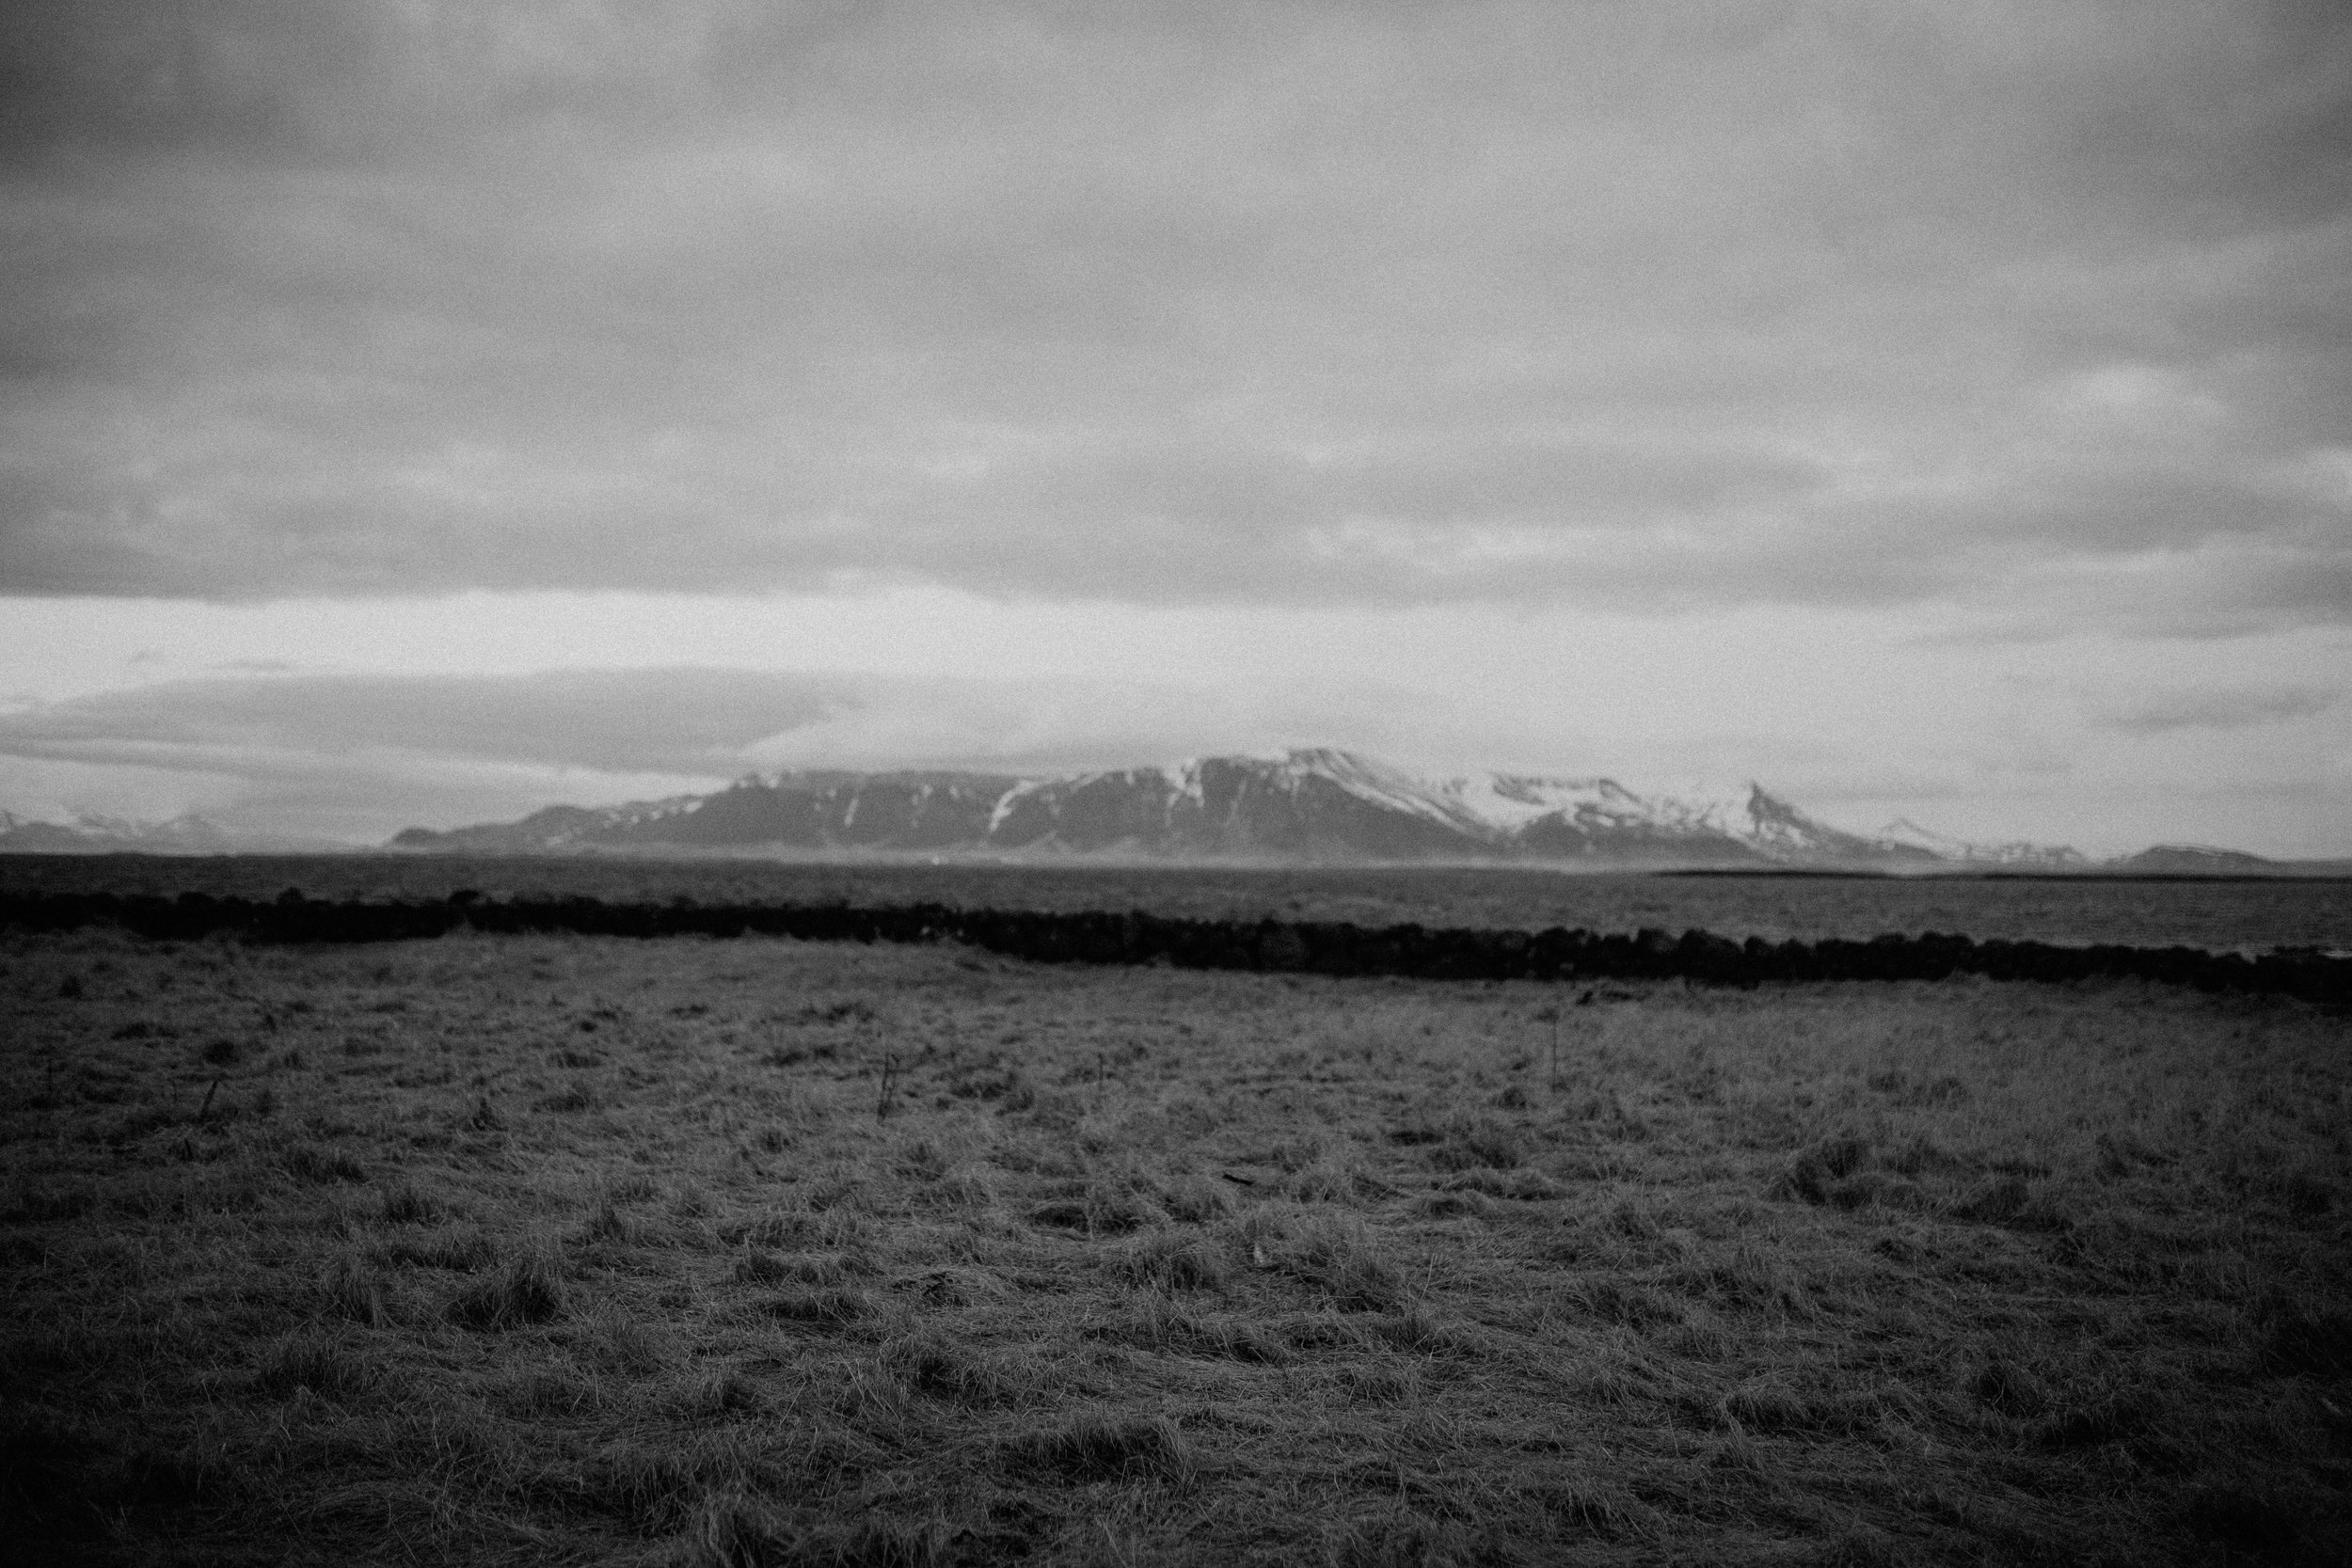 iceland-8747.jpg